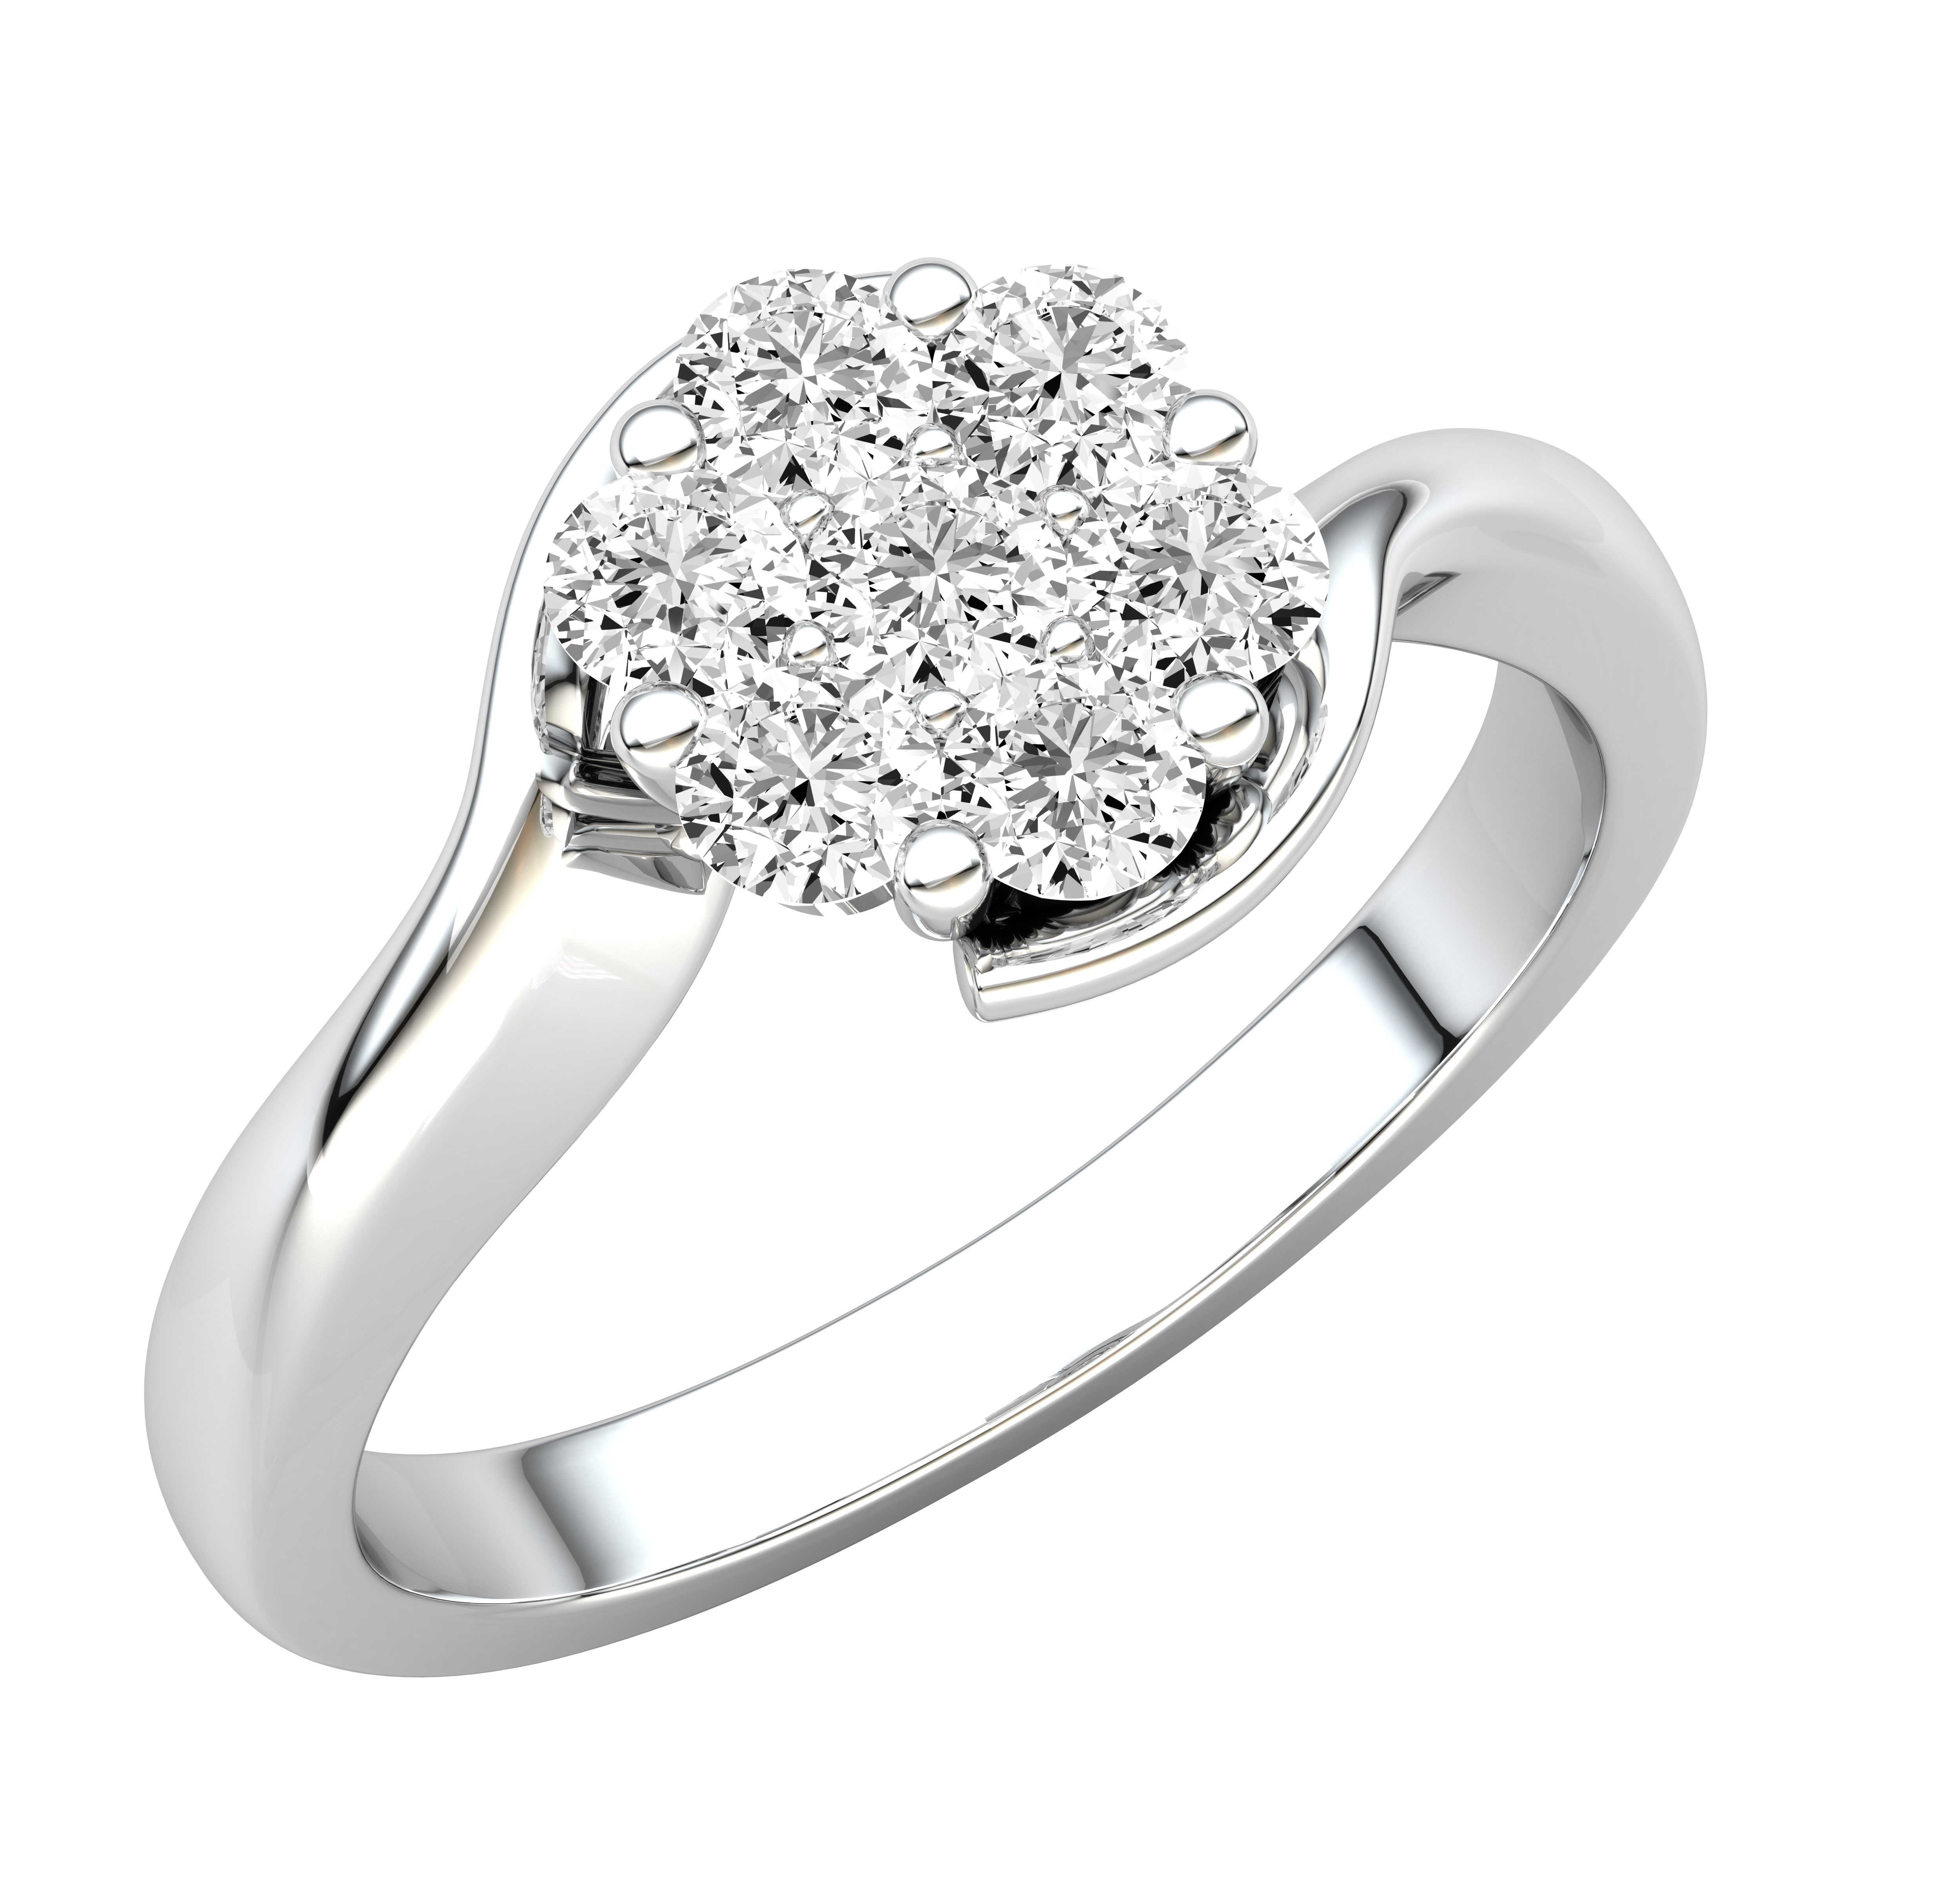 Inel de Logodna Cluster cu Mai Multe Diamante Dama Aur Alb 18kt cu Diamante Rotunde-img1